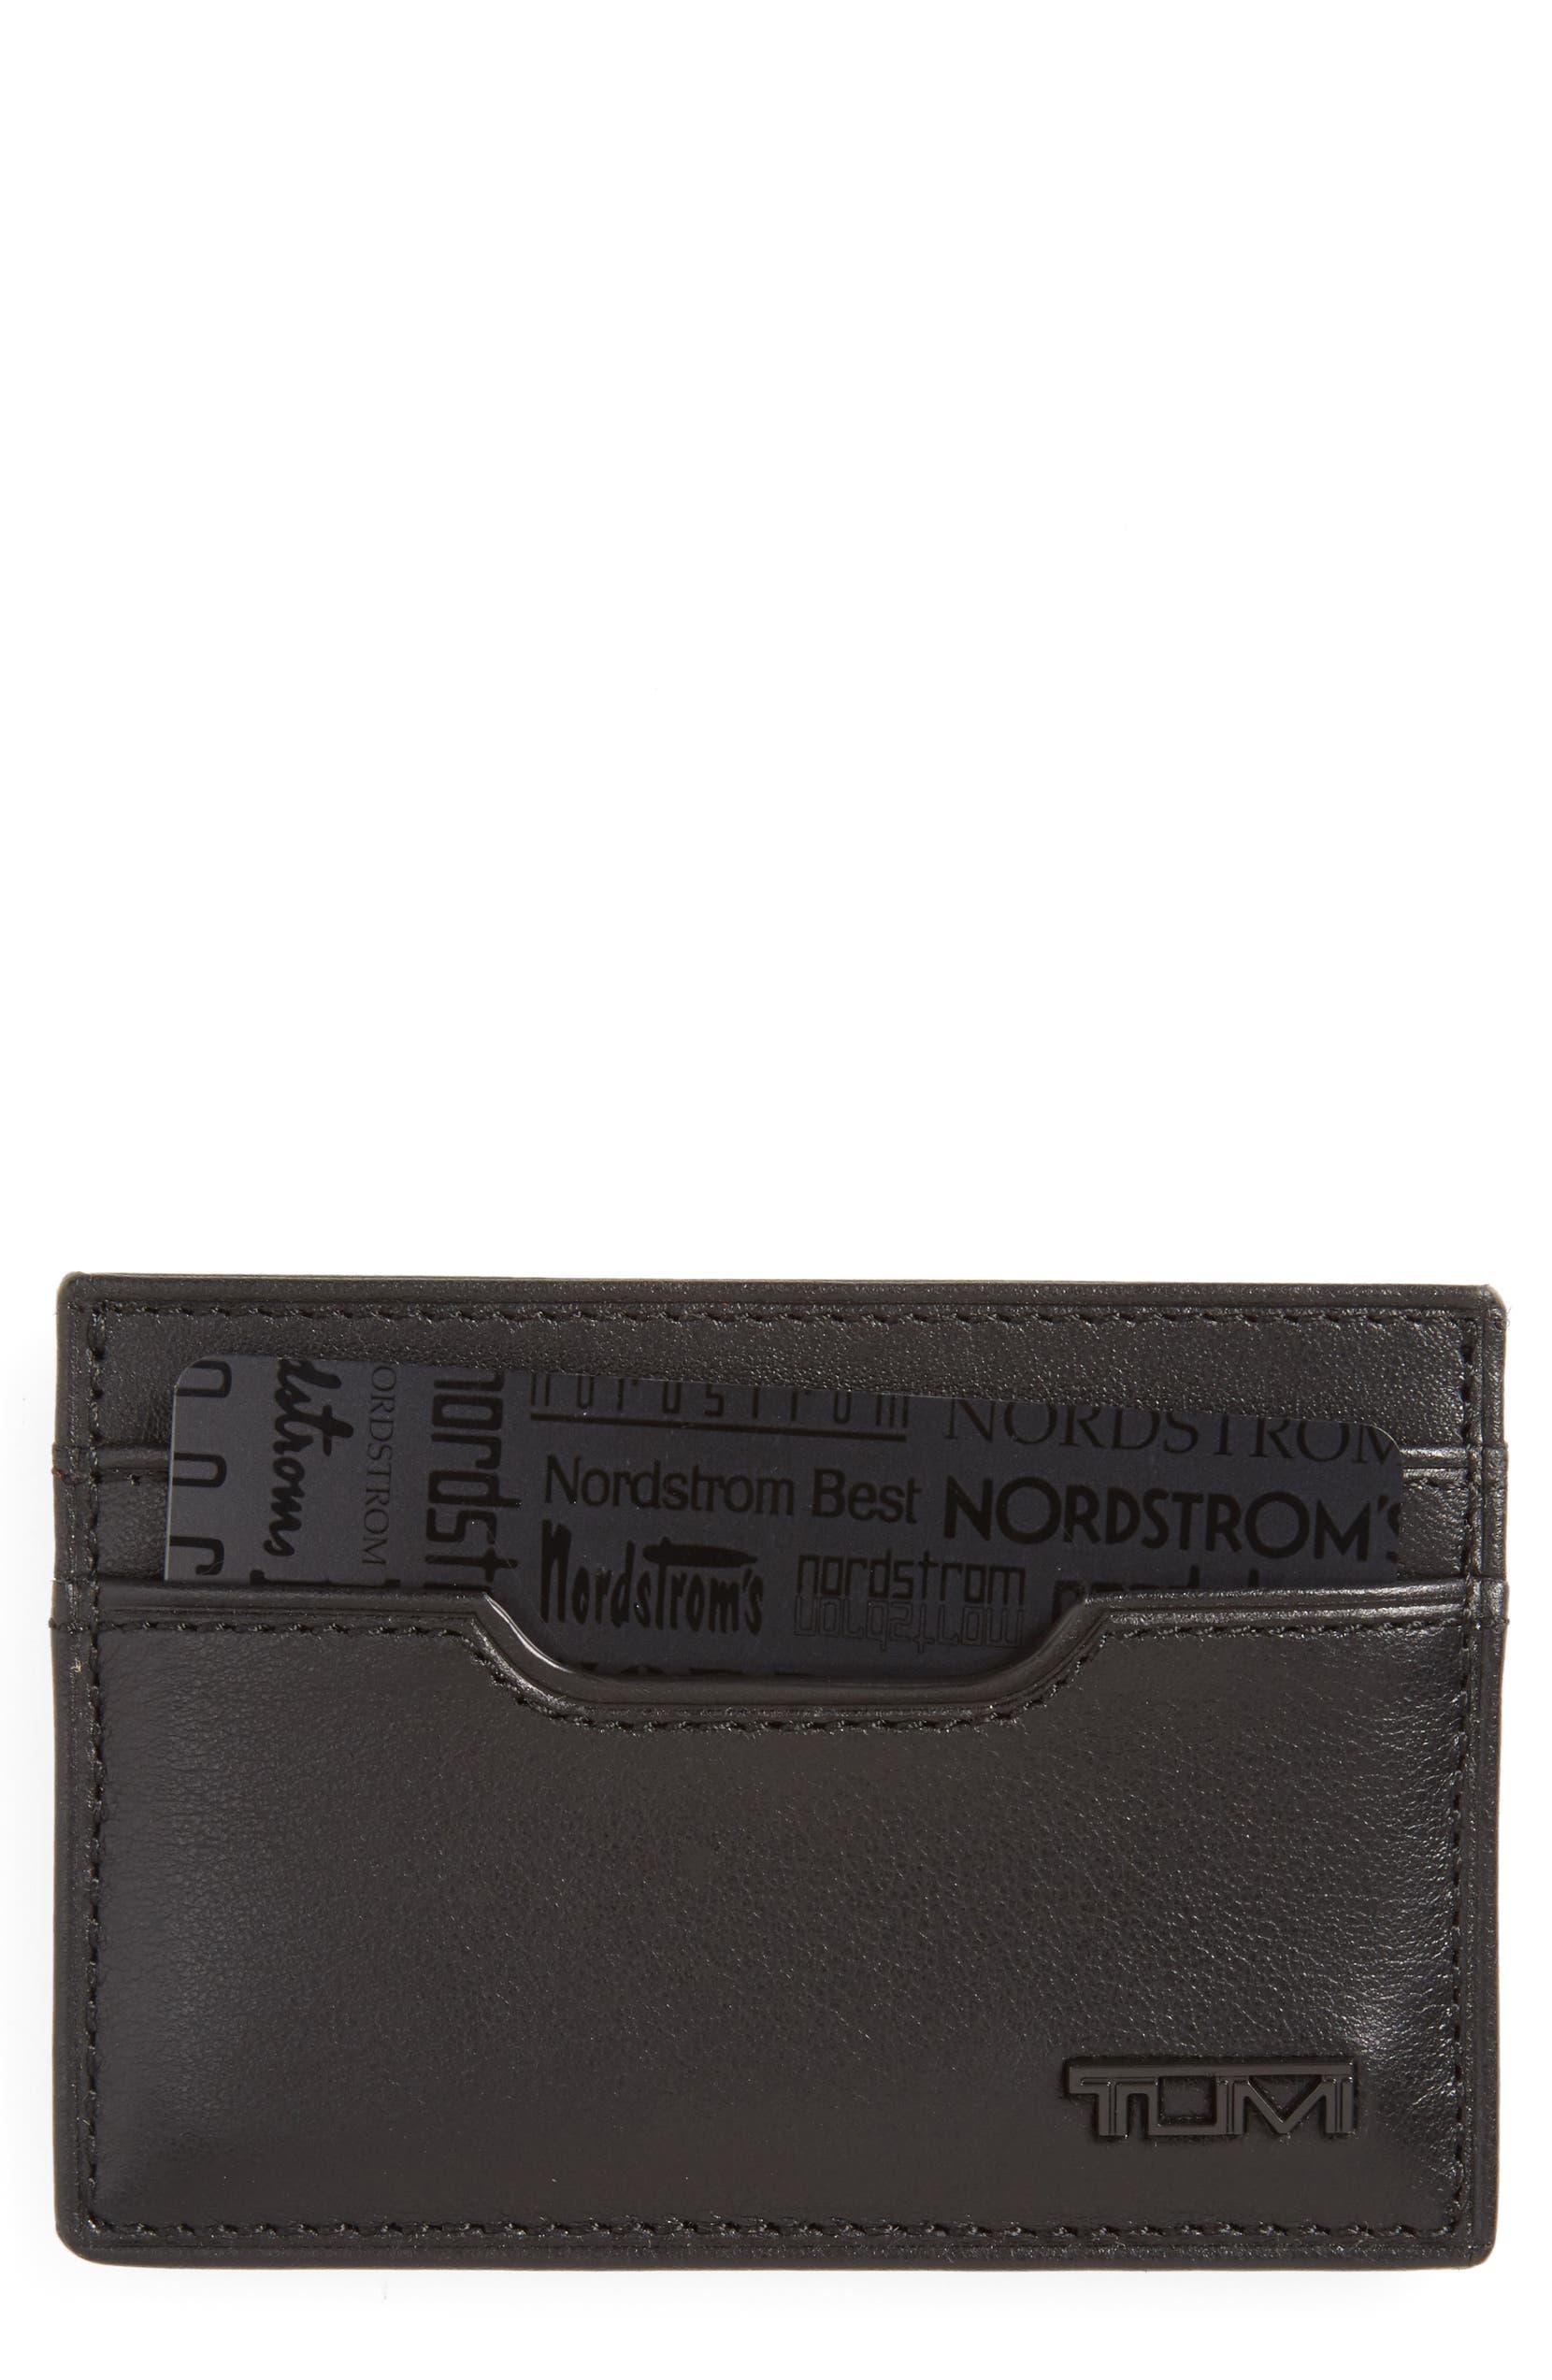 08937b370b Delta - ID Lock™ Shielded Slim Card Case & ID Wallet